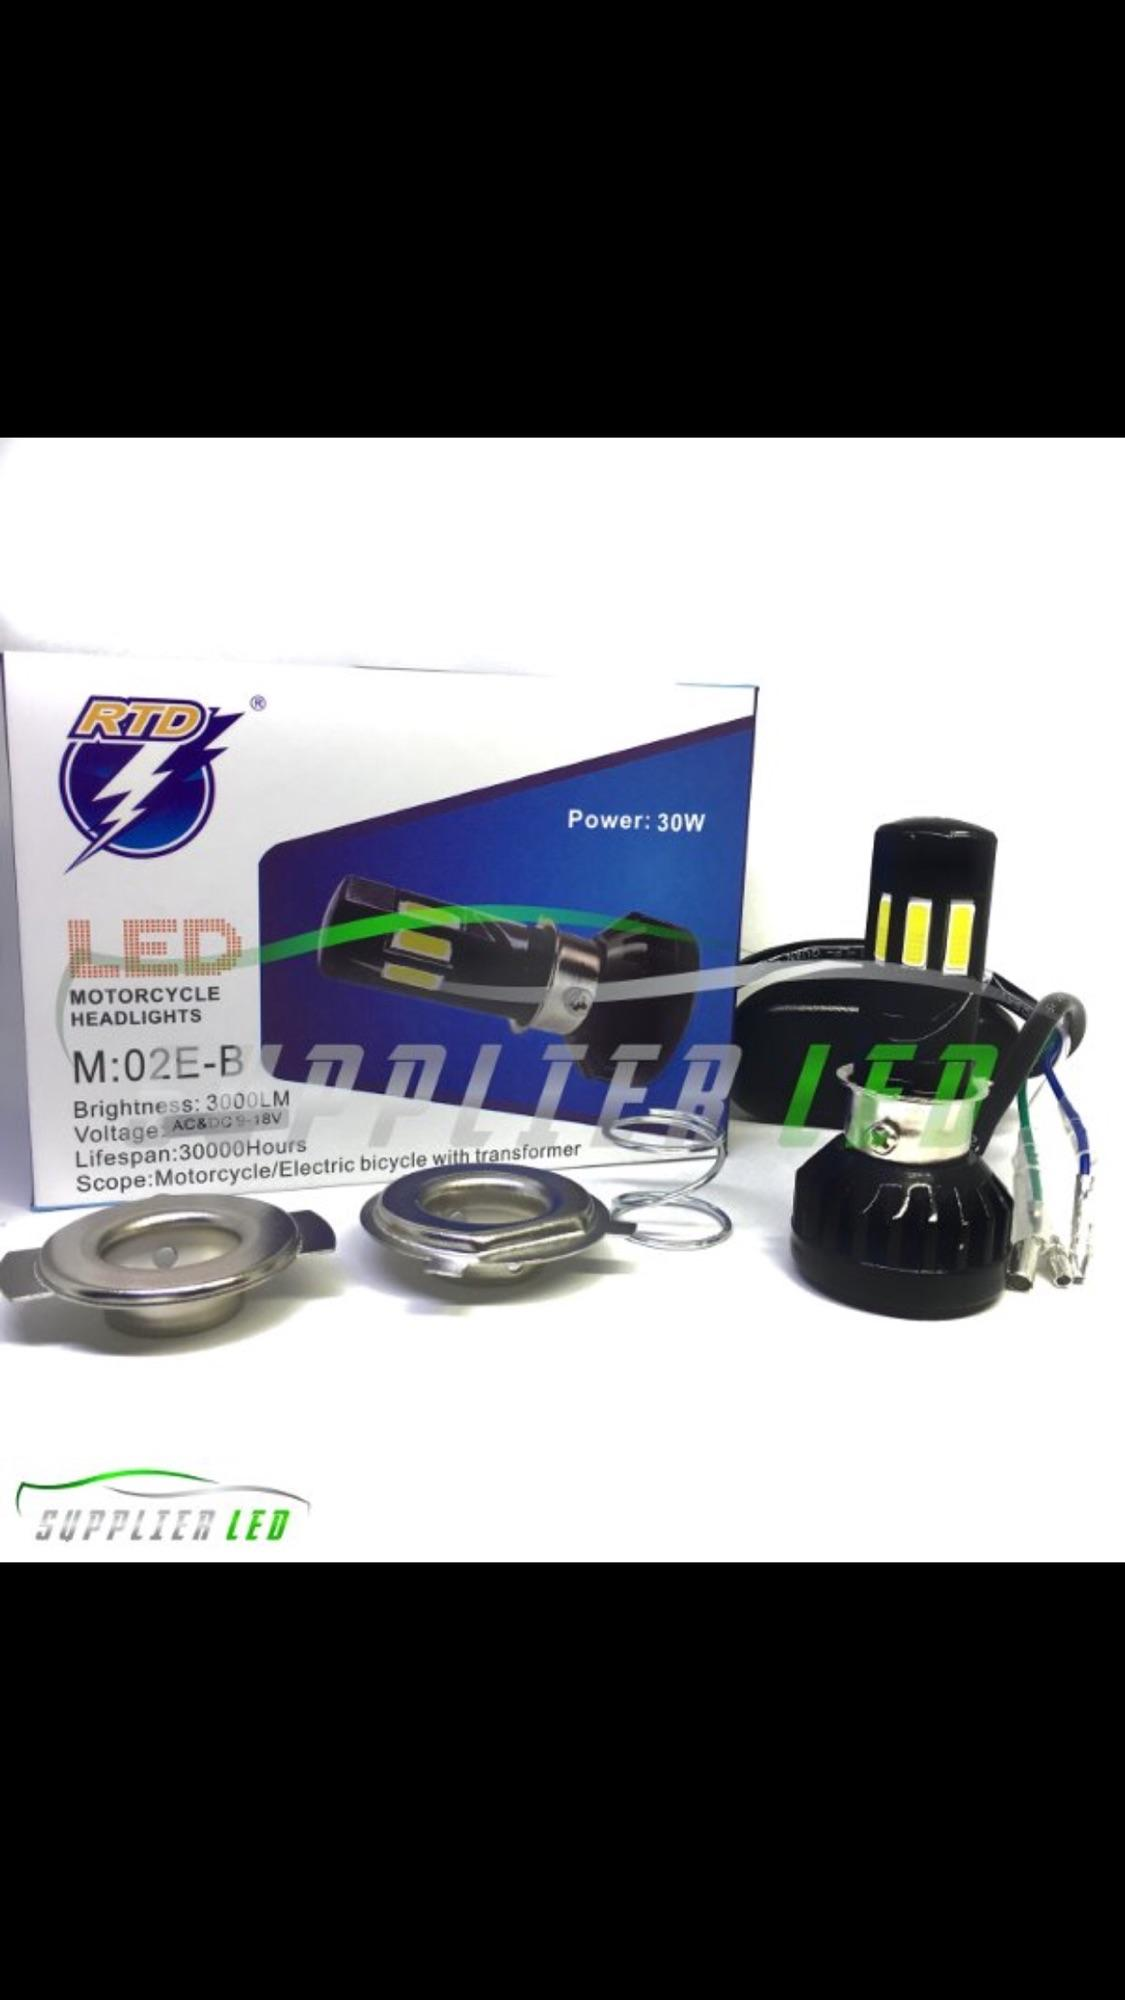 Bohlam Led Hid Motor Terbaru Lampu Senja T10 Jelly Silicon Rgb Remote Utama Mobil 6 Sisi Rtd M02e B